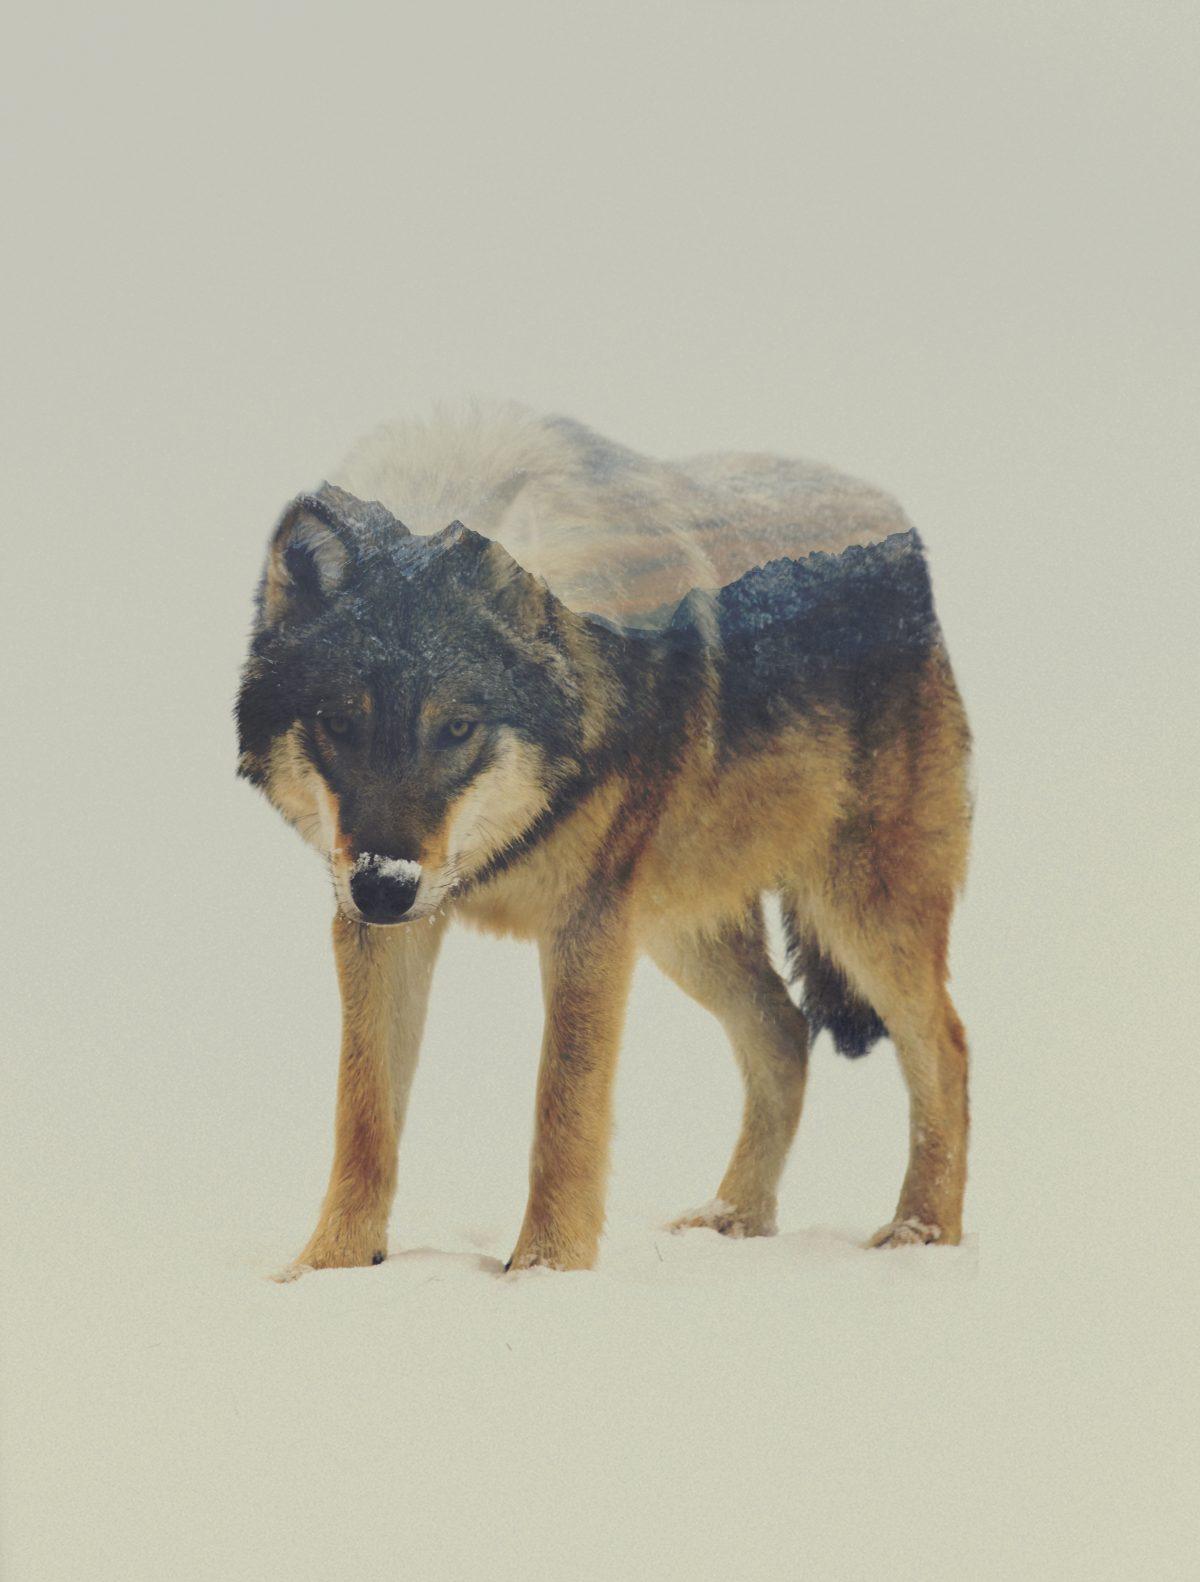 ulf-andreas-lie-fisheyelemag